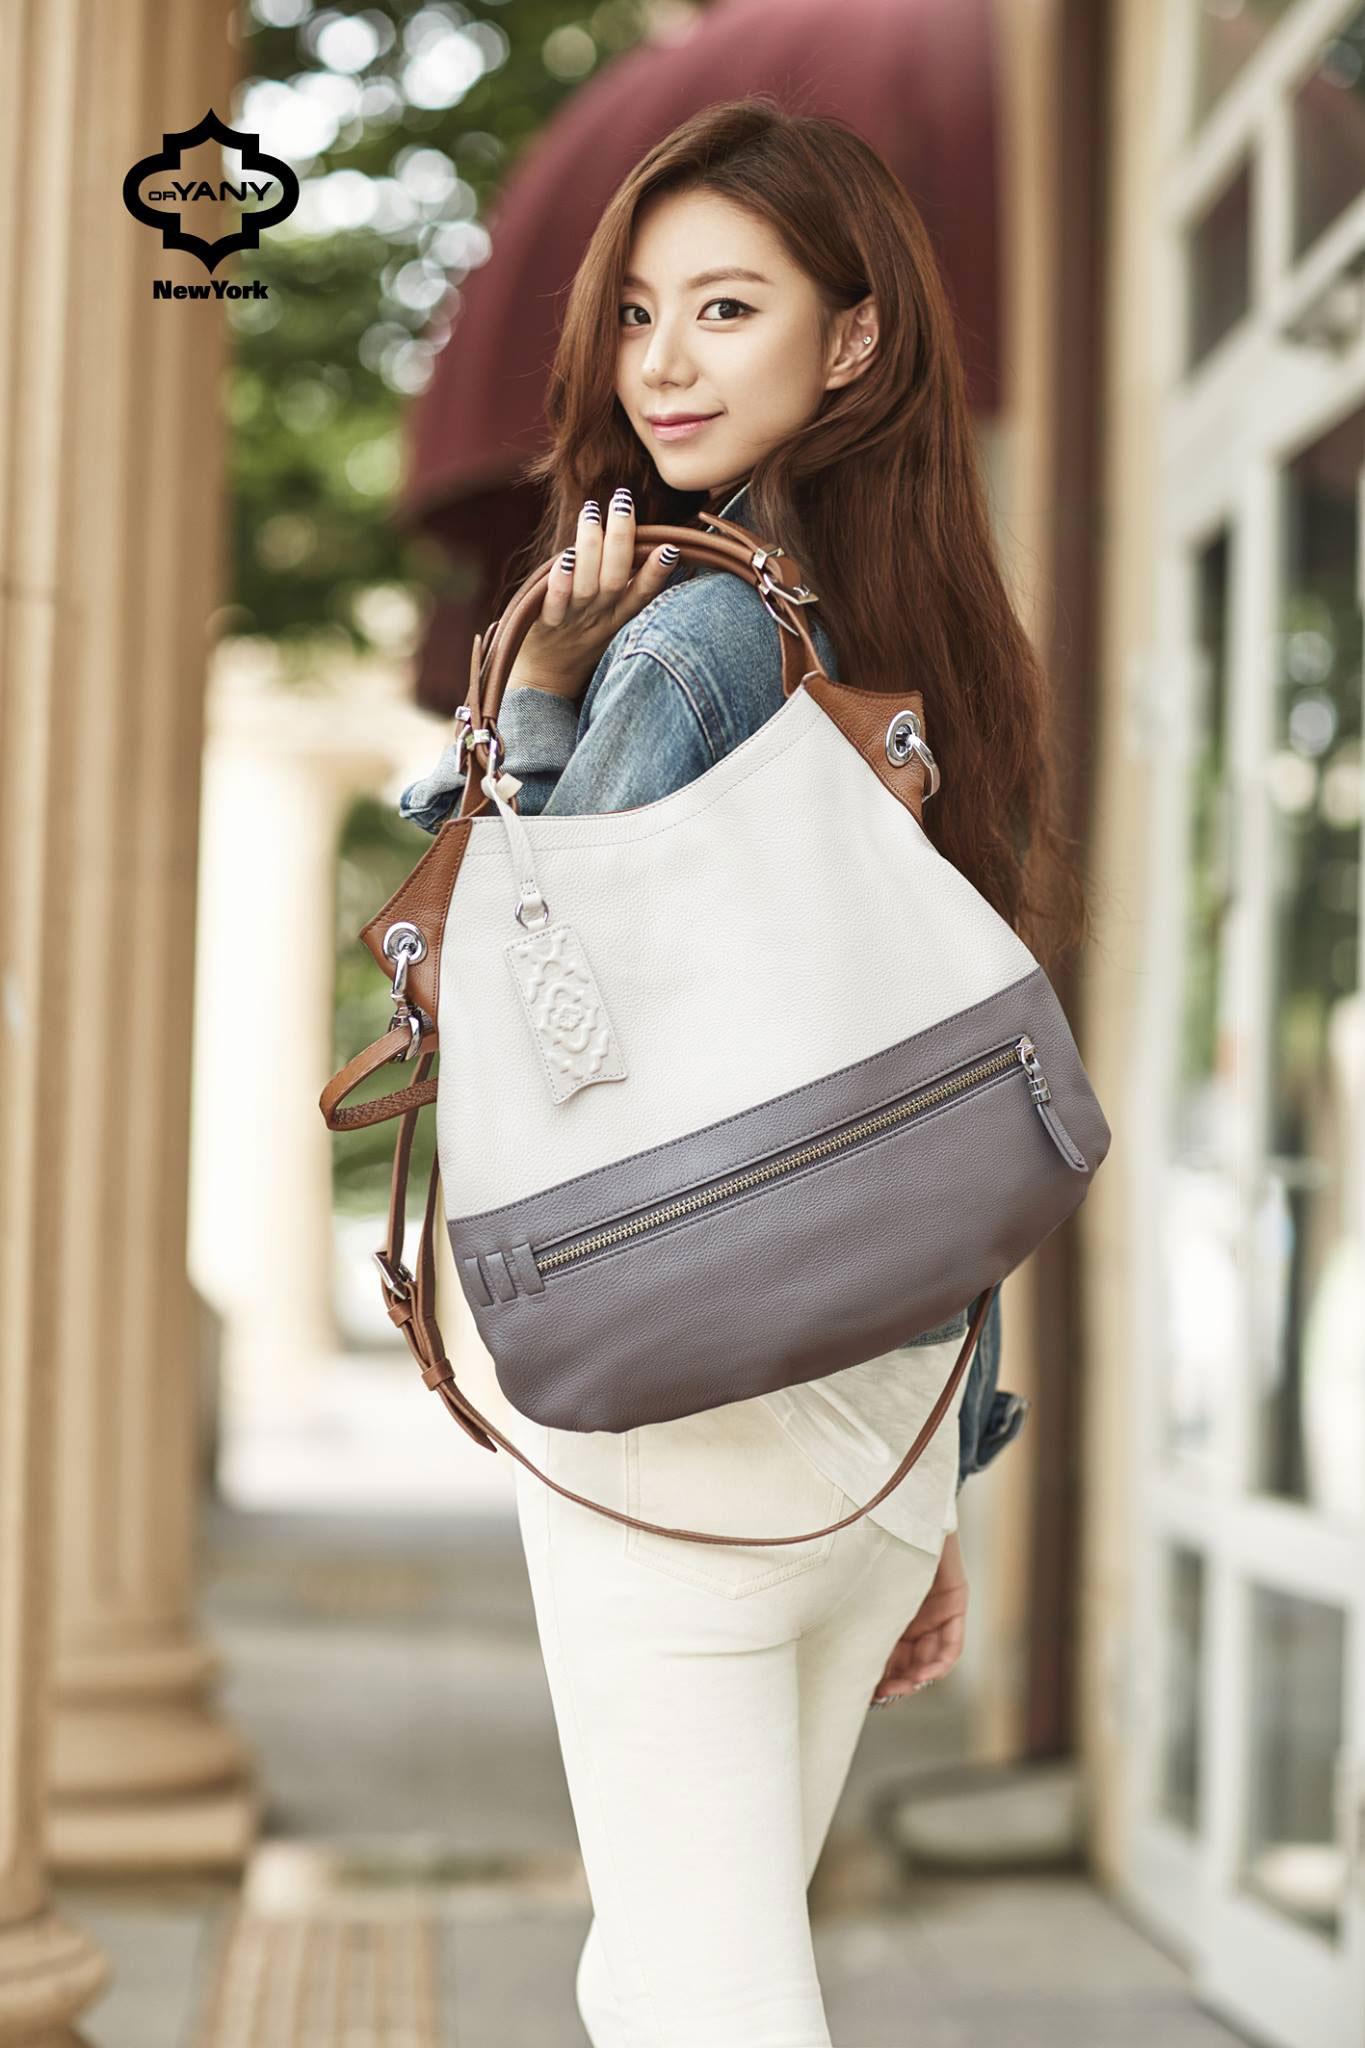 Park Soo Jin Oryany New York handbags